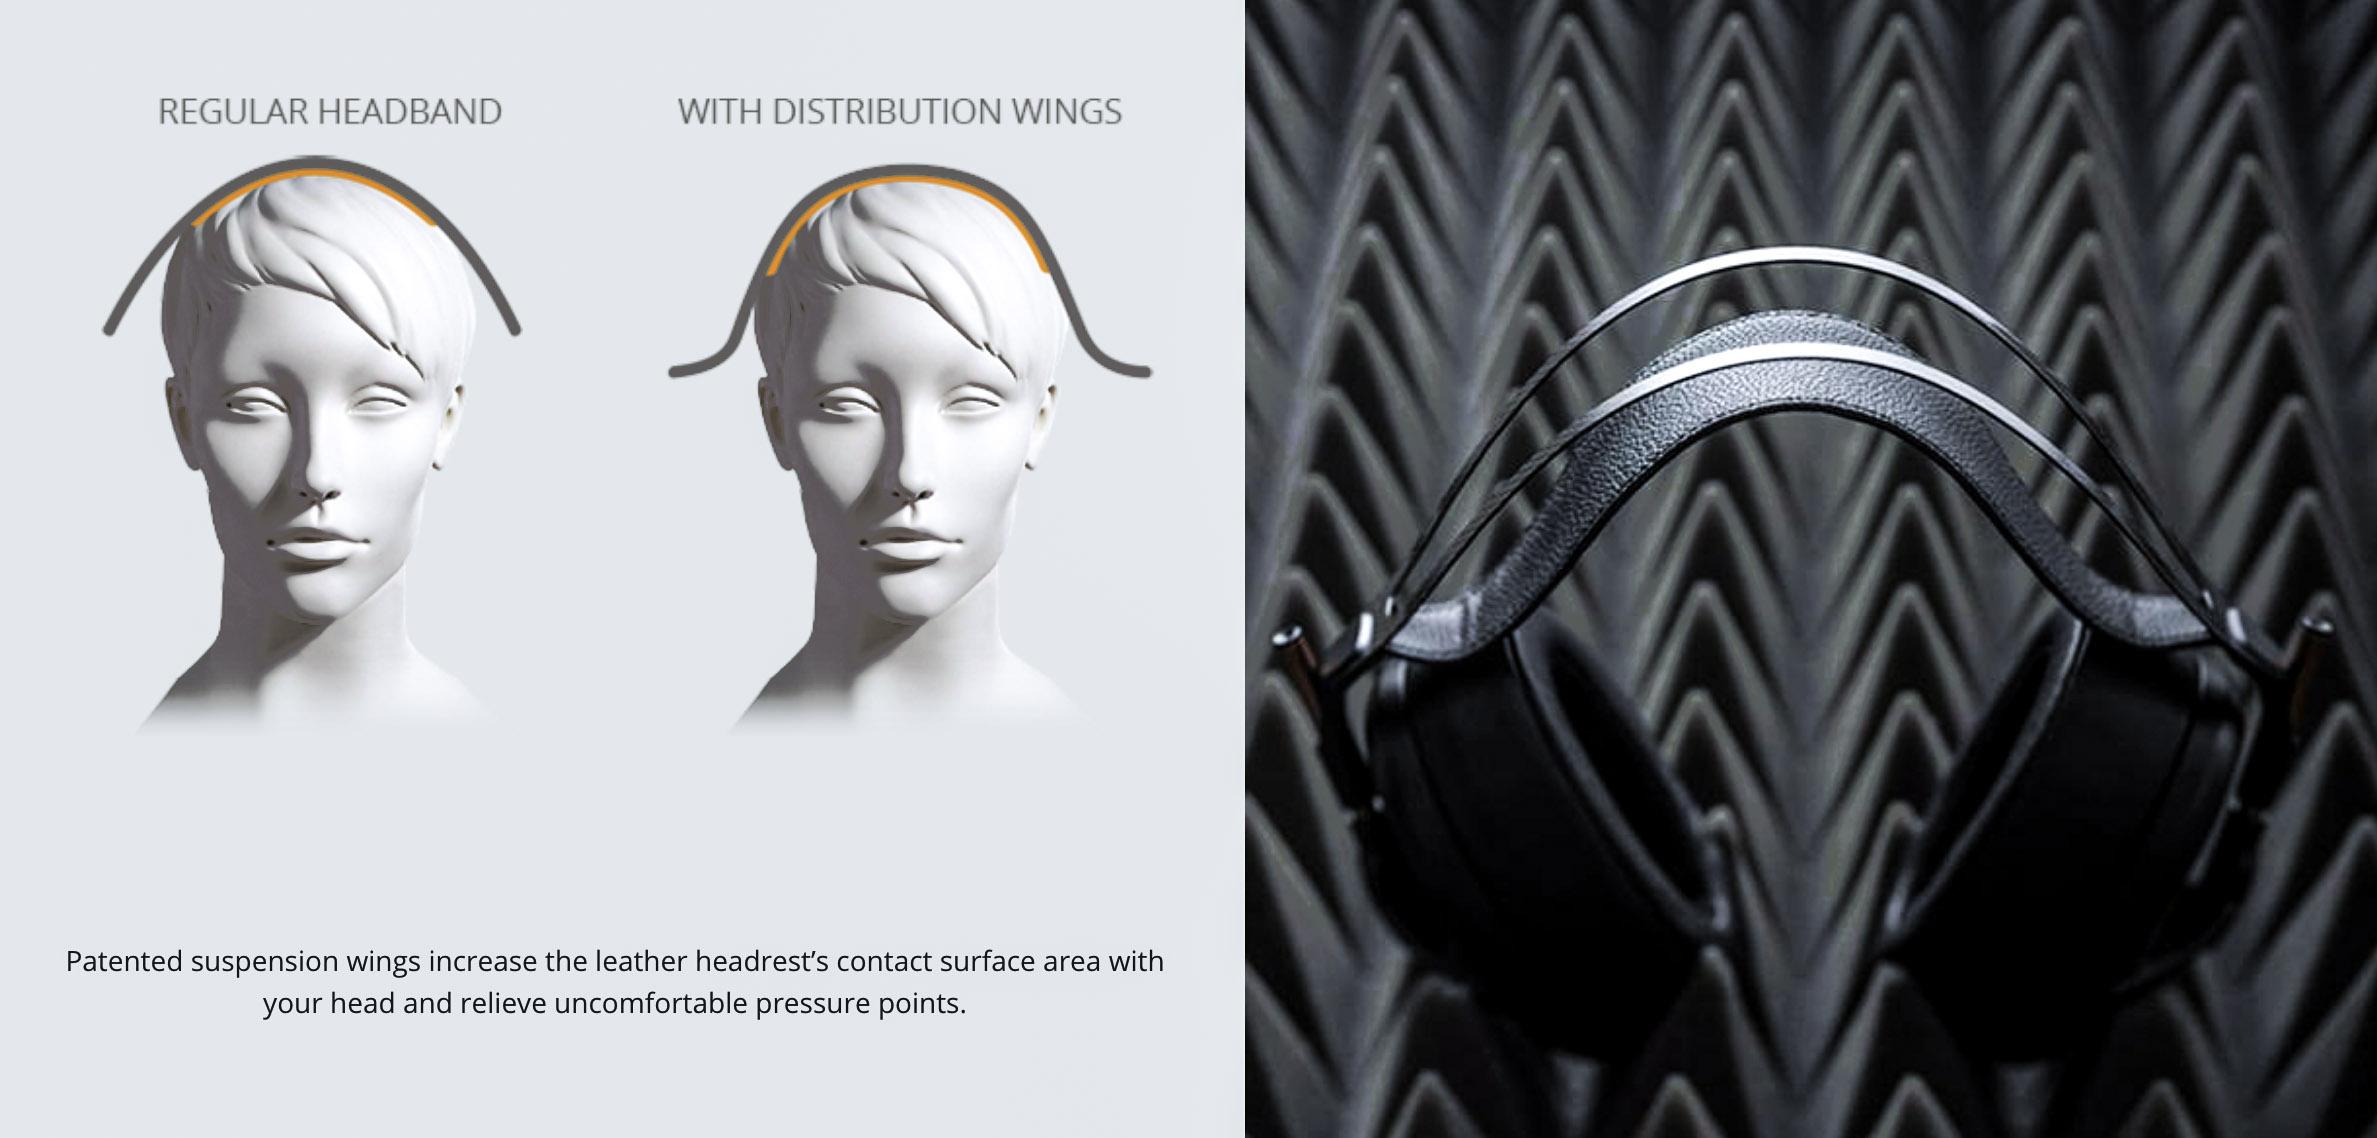 meze-empyrean-headphones-headband.jpg